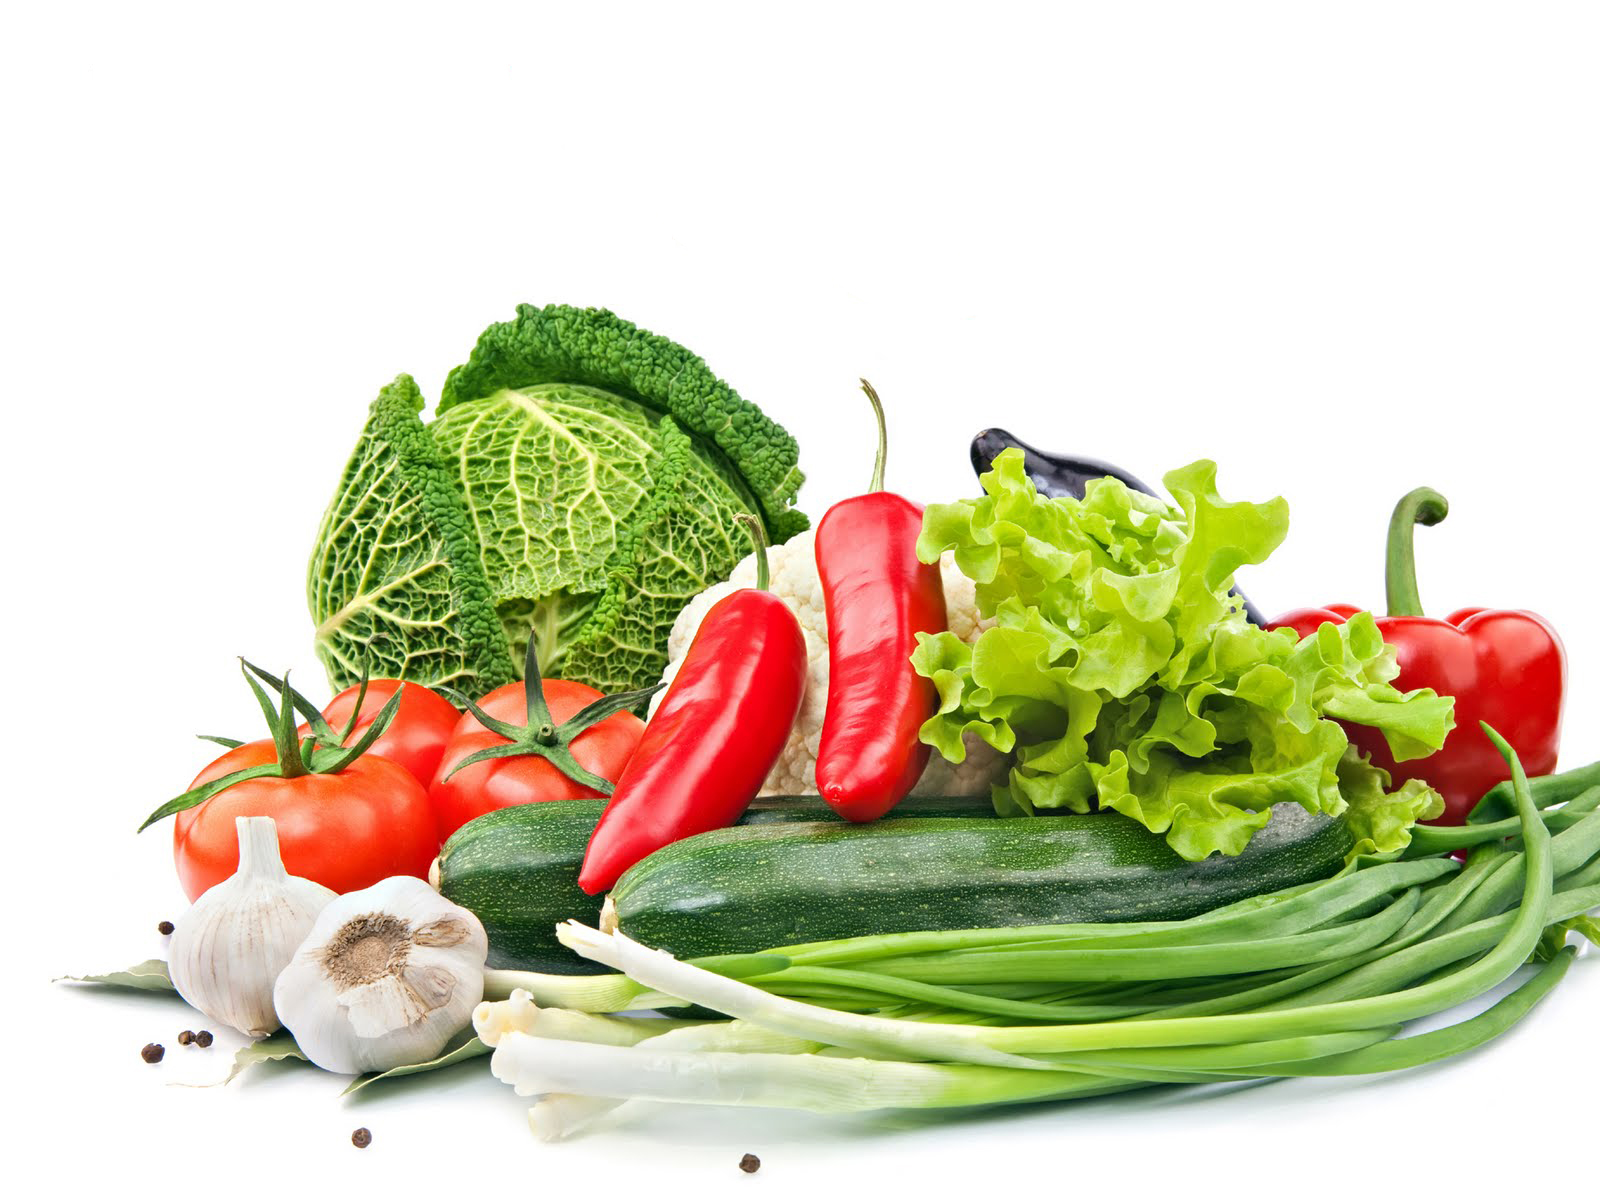 http://4.bp.blogspot.com/-PuHDLIm4qzk/T8q07Ra9DiI/AAAAAAAABIA/HKBoCuHqxVA/s1600/Fresh+Vegetables+HD+Wallpaper+(1).jpg